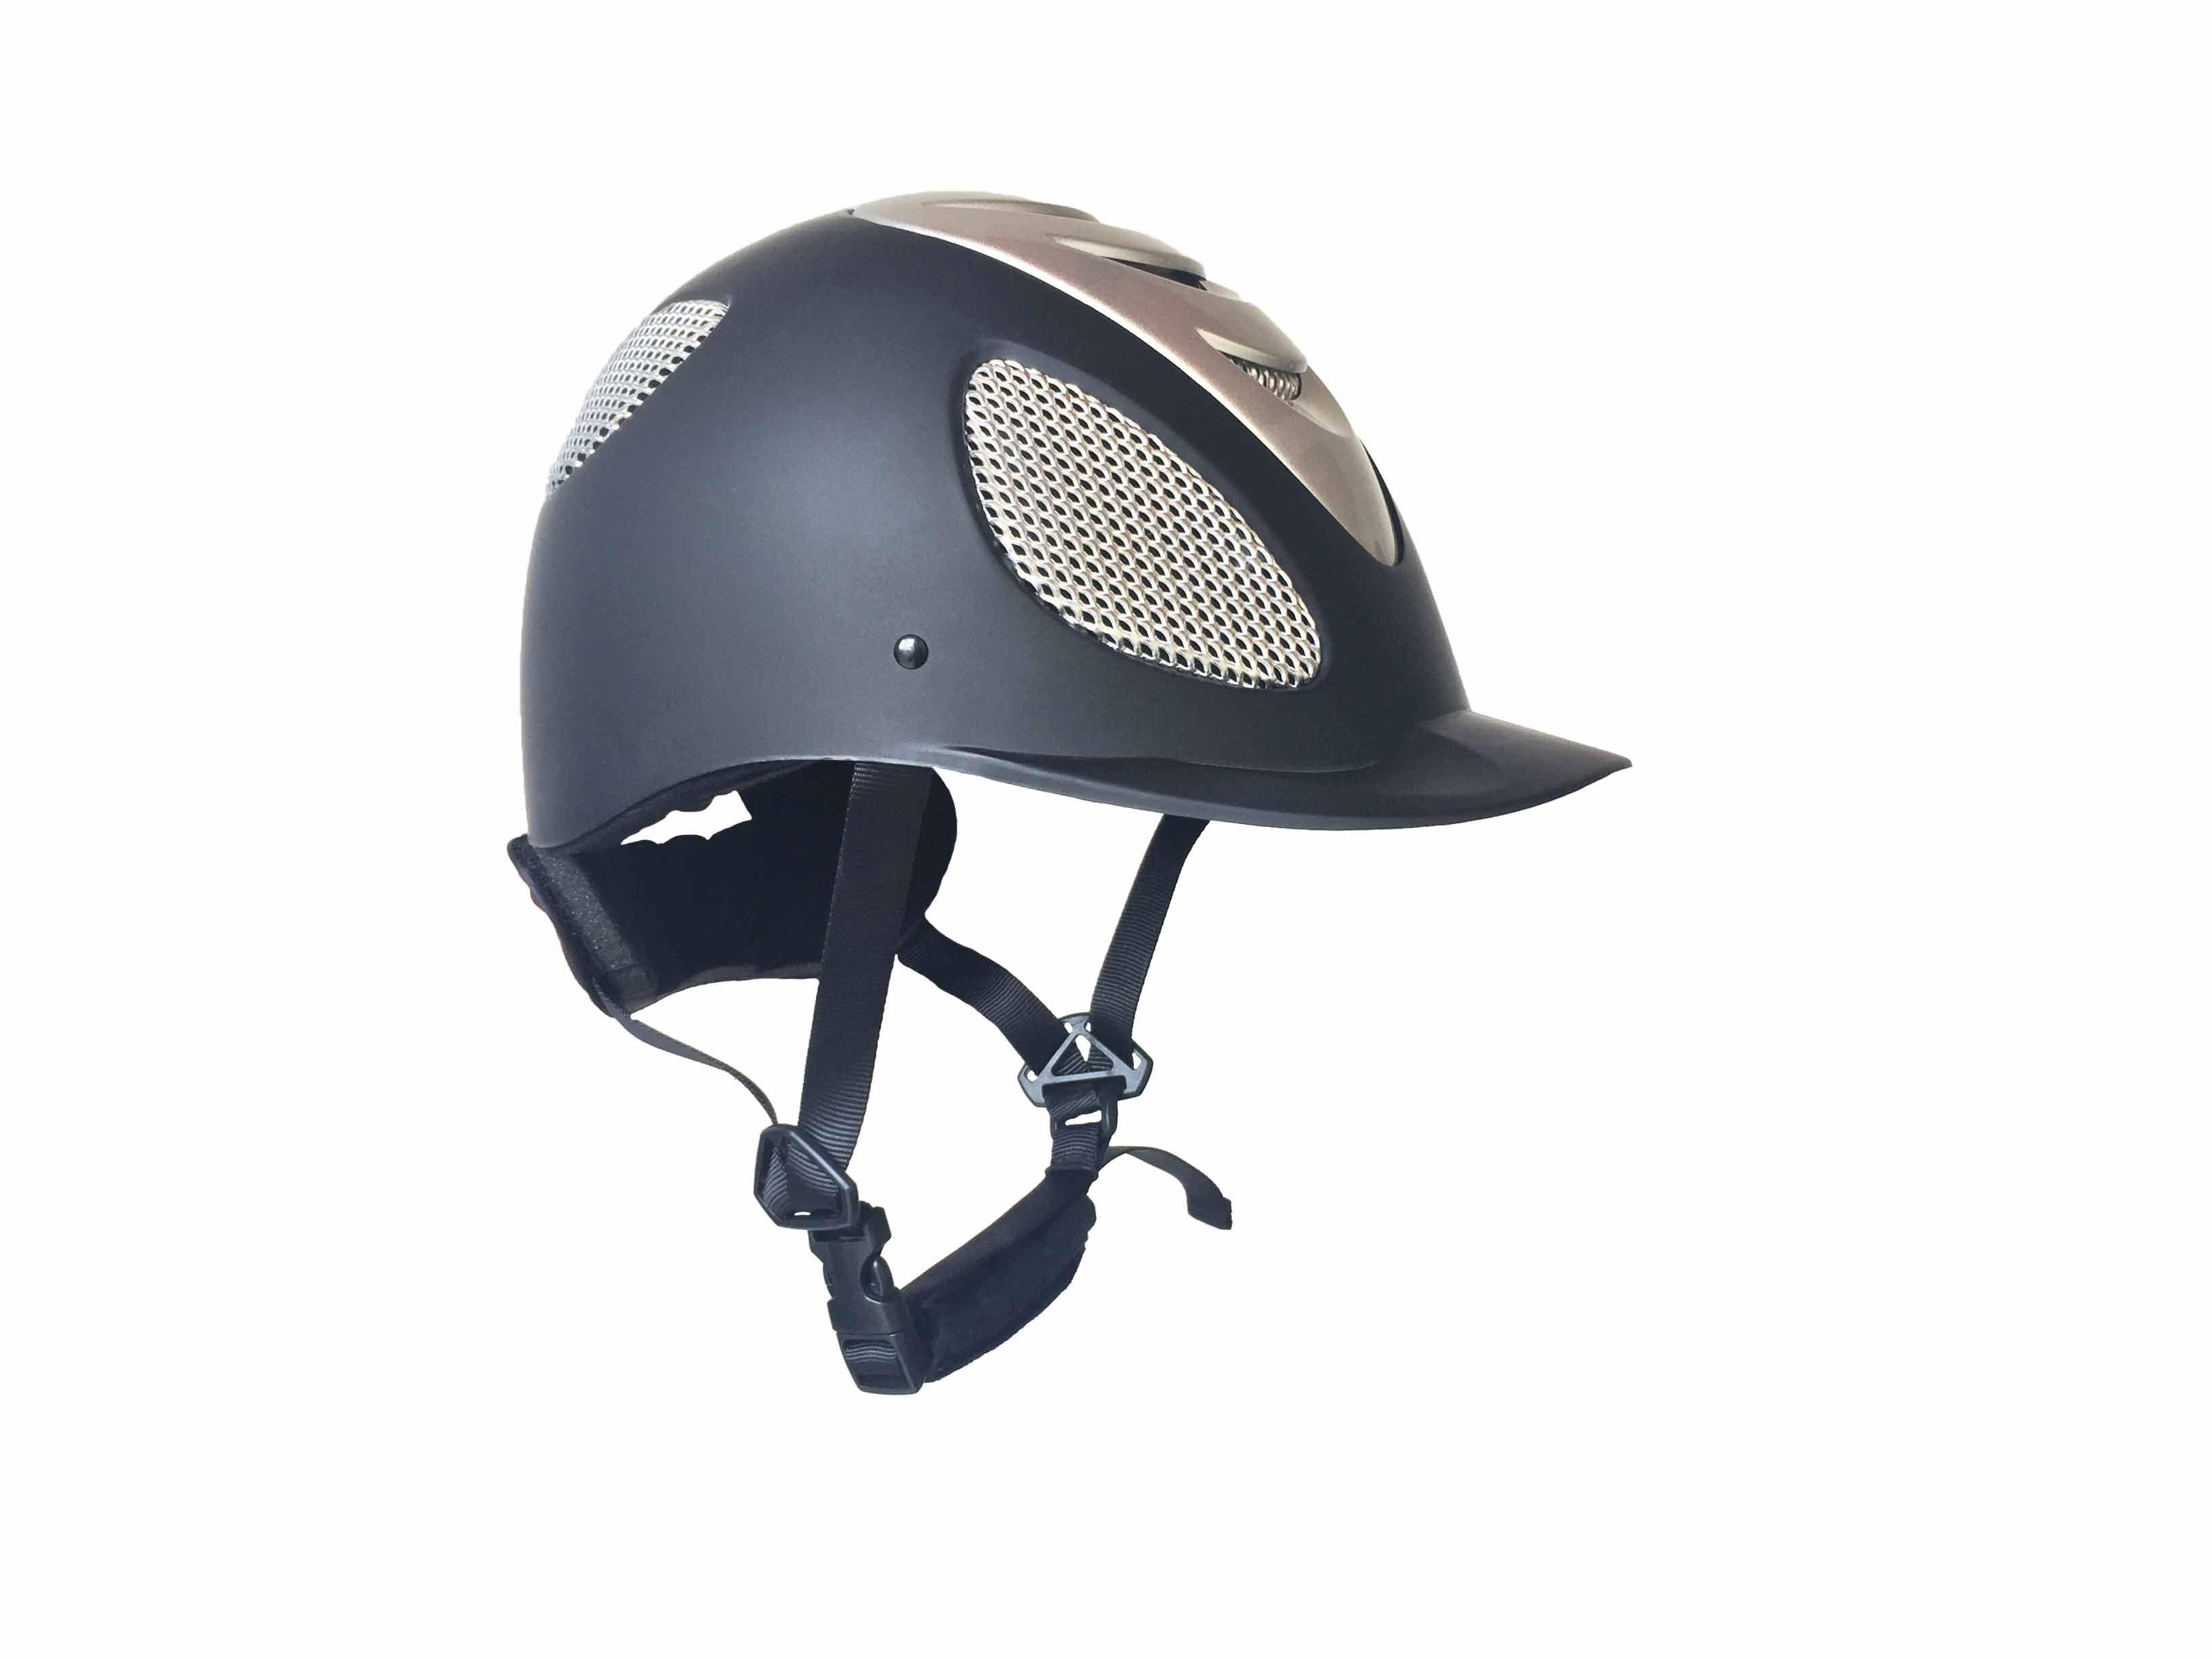 casco jinete